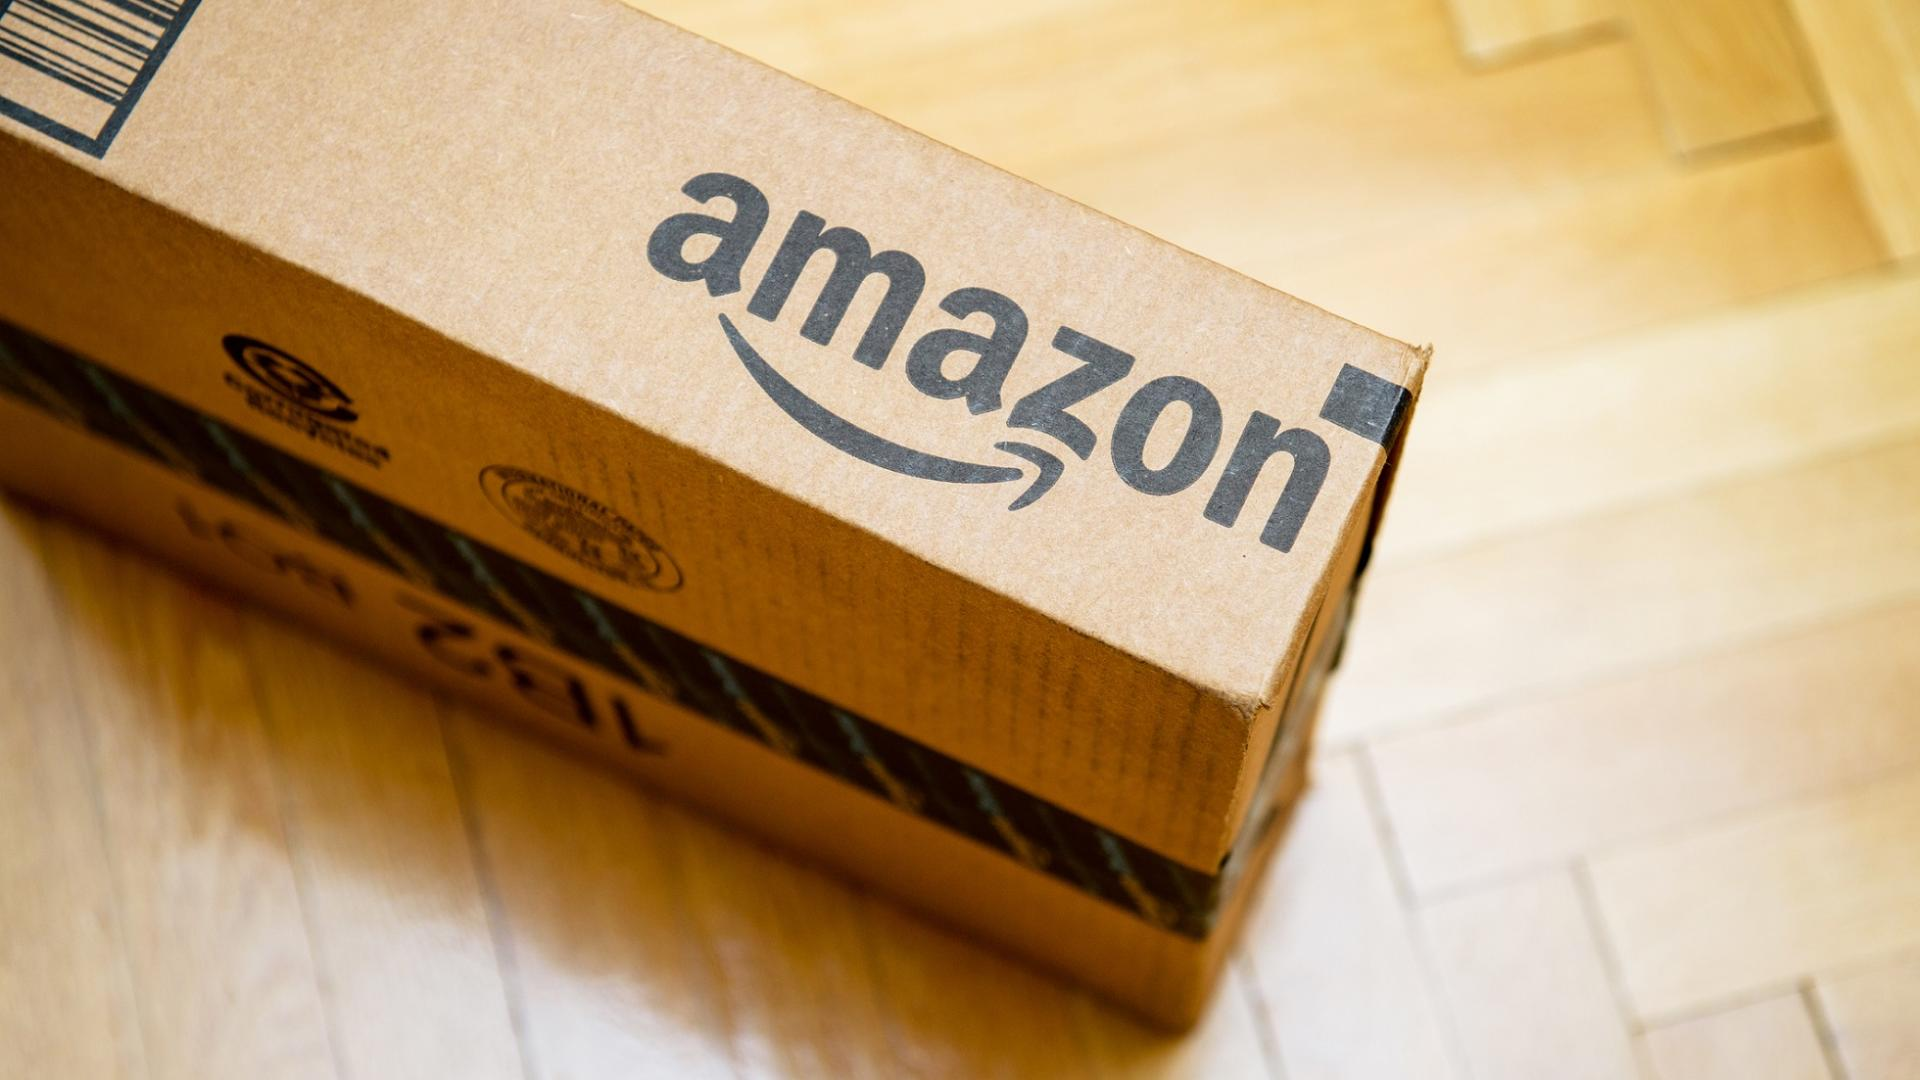 Amazon Paket mit Amazon-Logo auf dem Holzboden